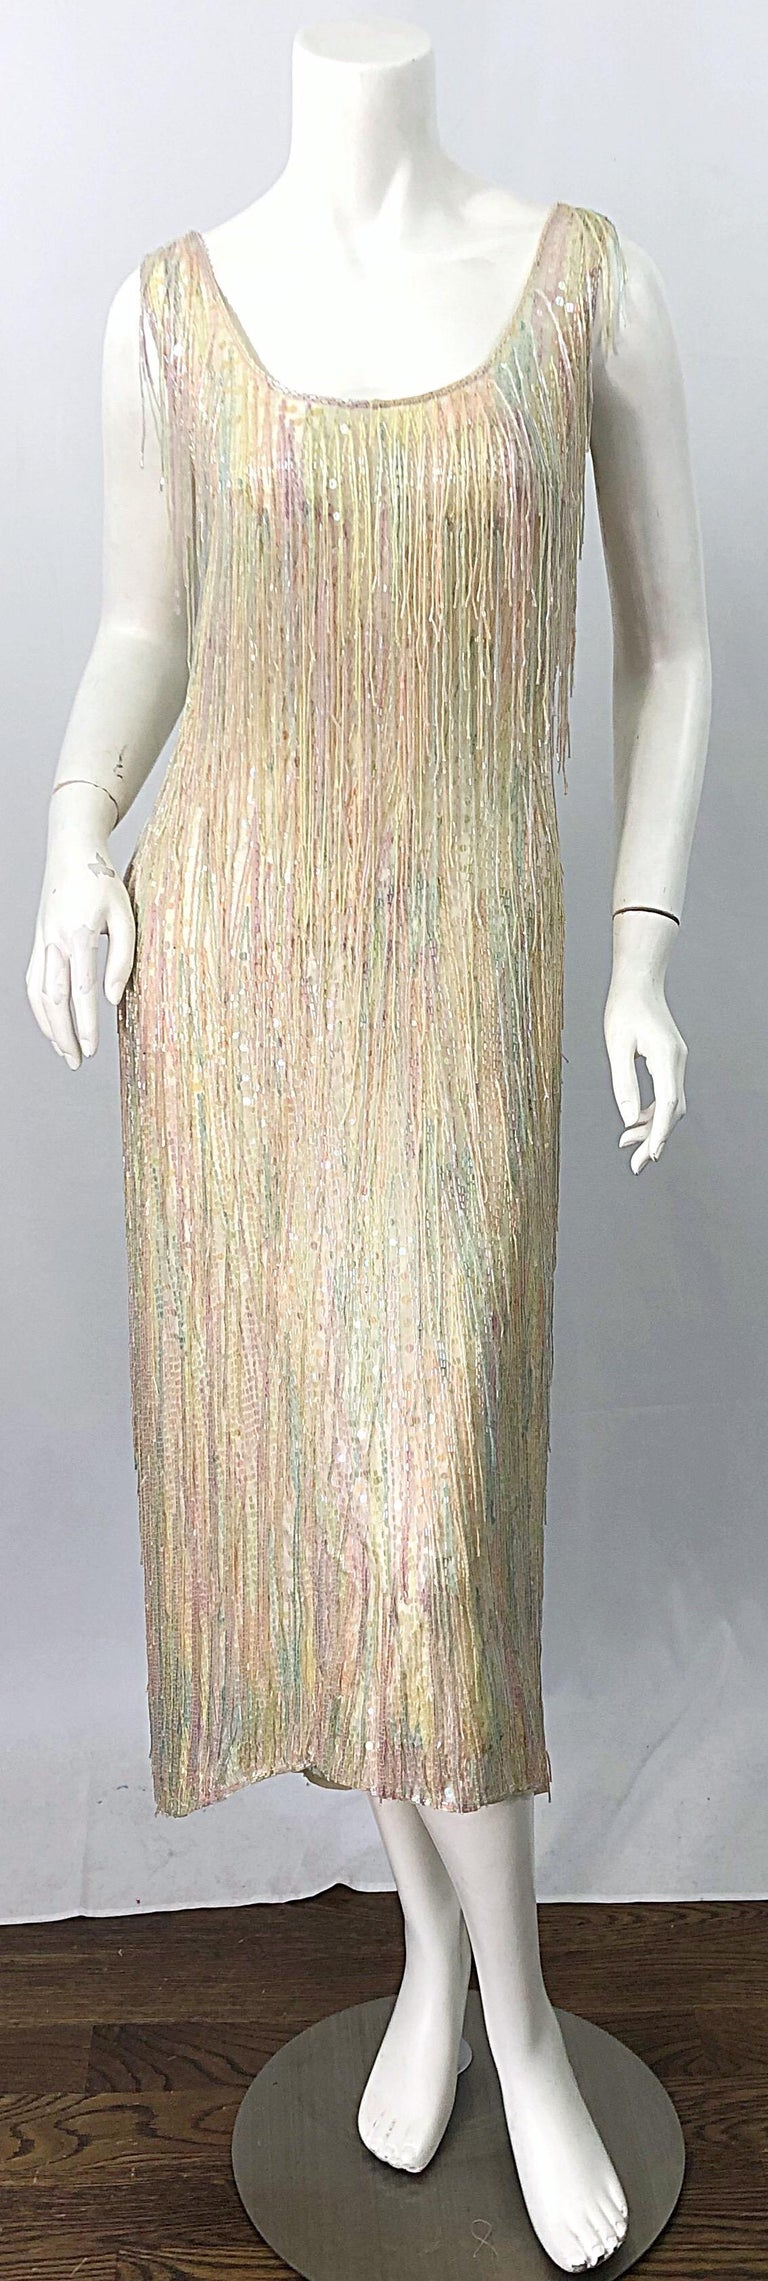 Halston MET Musuem 1970s Fully Fringed Beaded Flapper Style Vintage 70s Dress For Sale 15